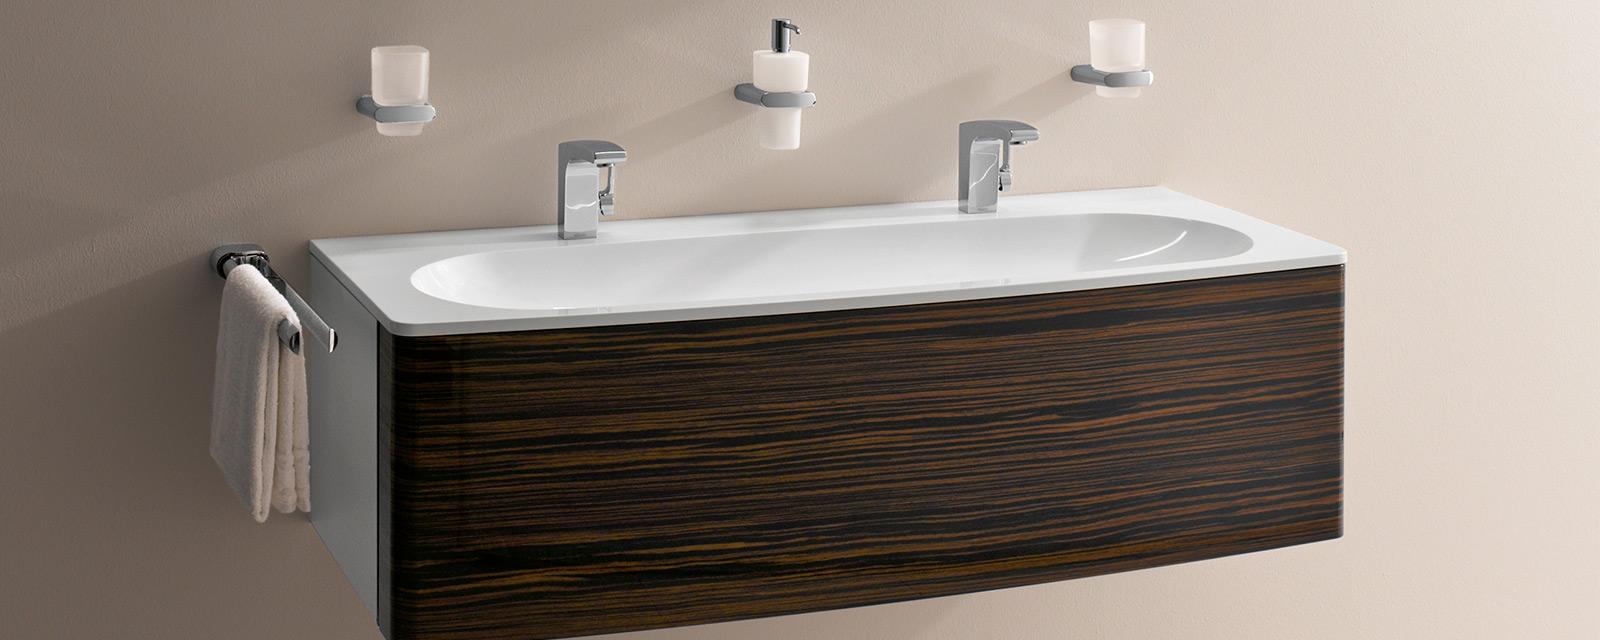 keuco b torok f rd szoba trend. Black Bedroom Furniture Sets. Home Design Ideas